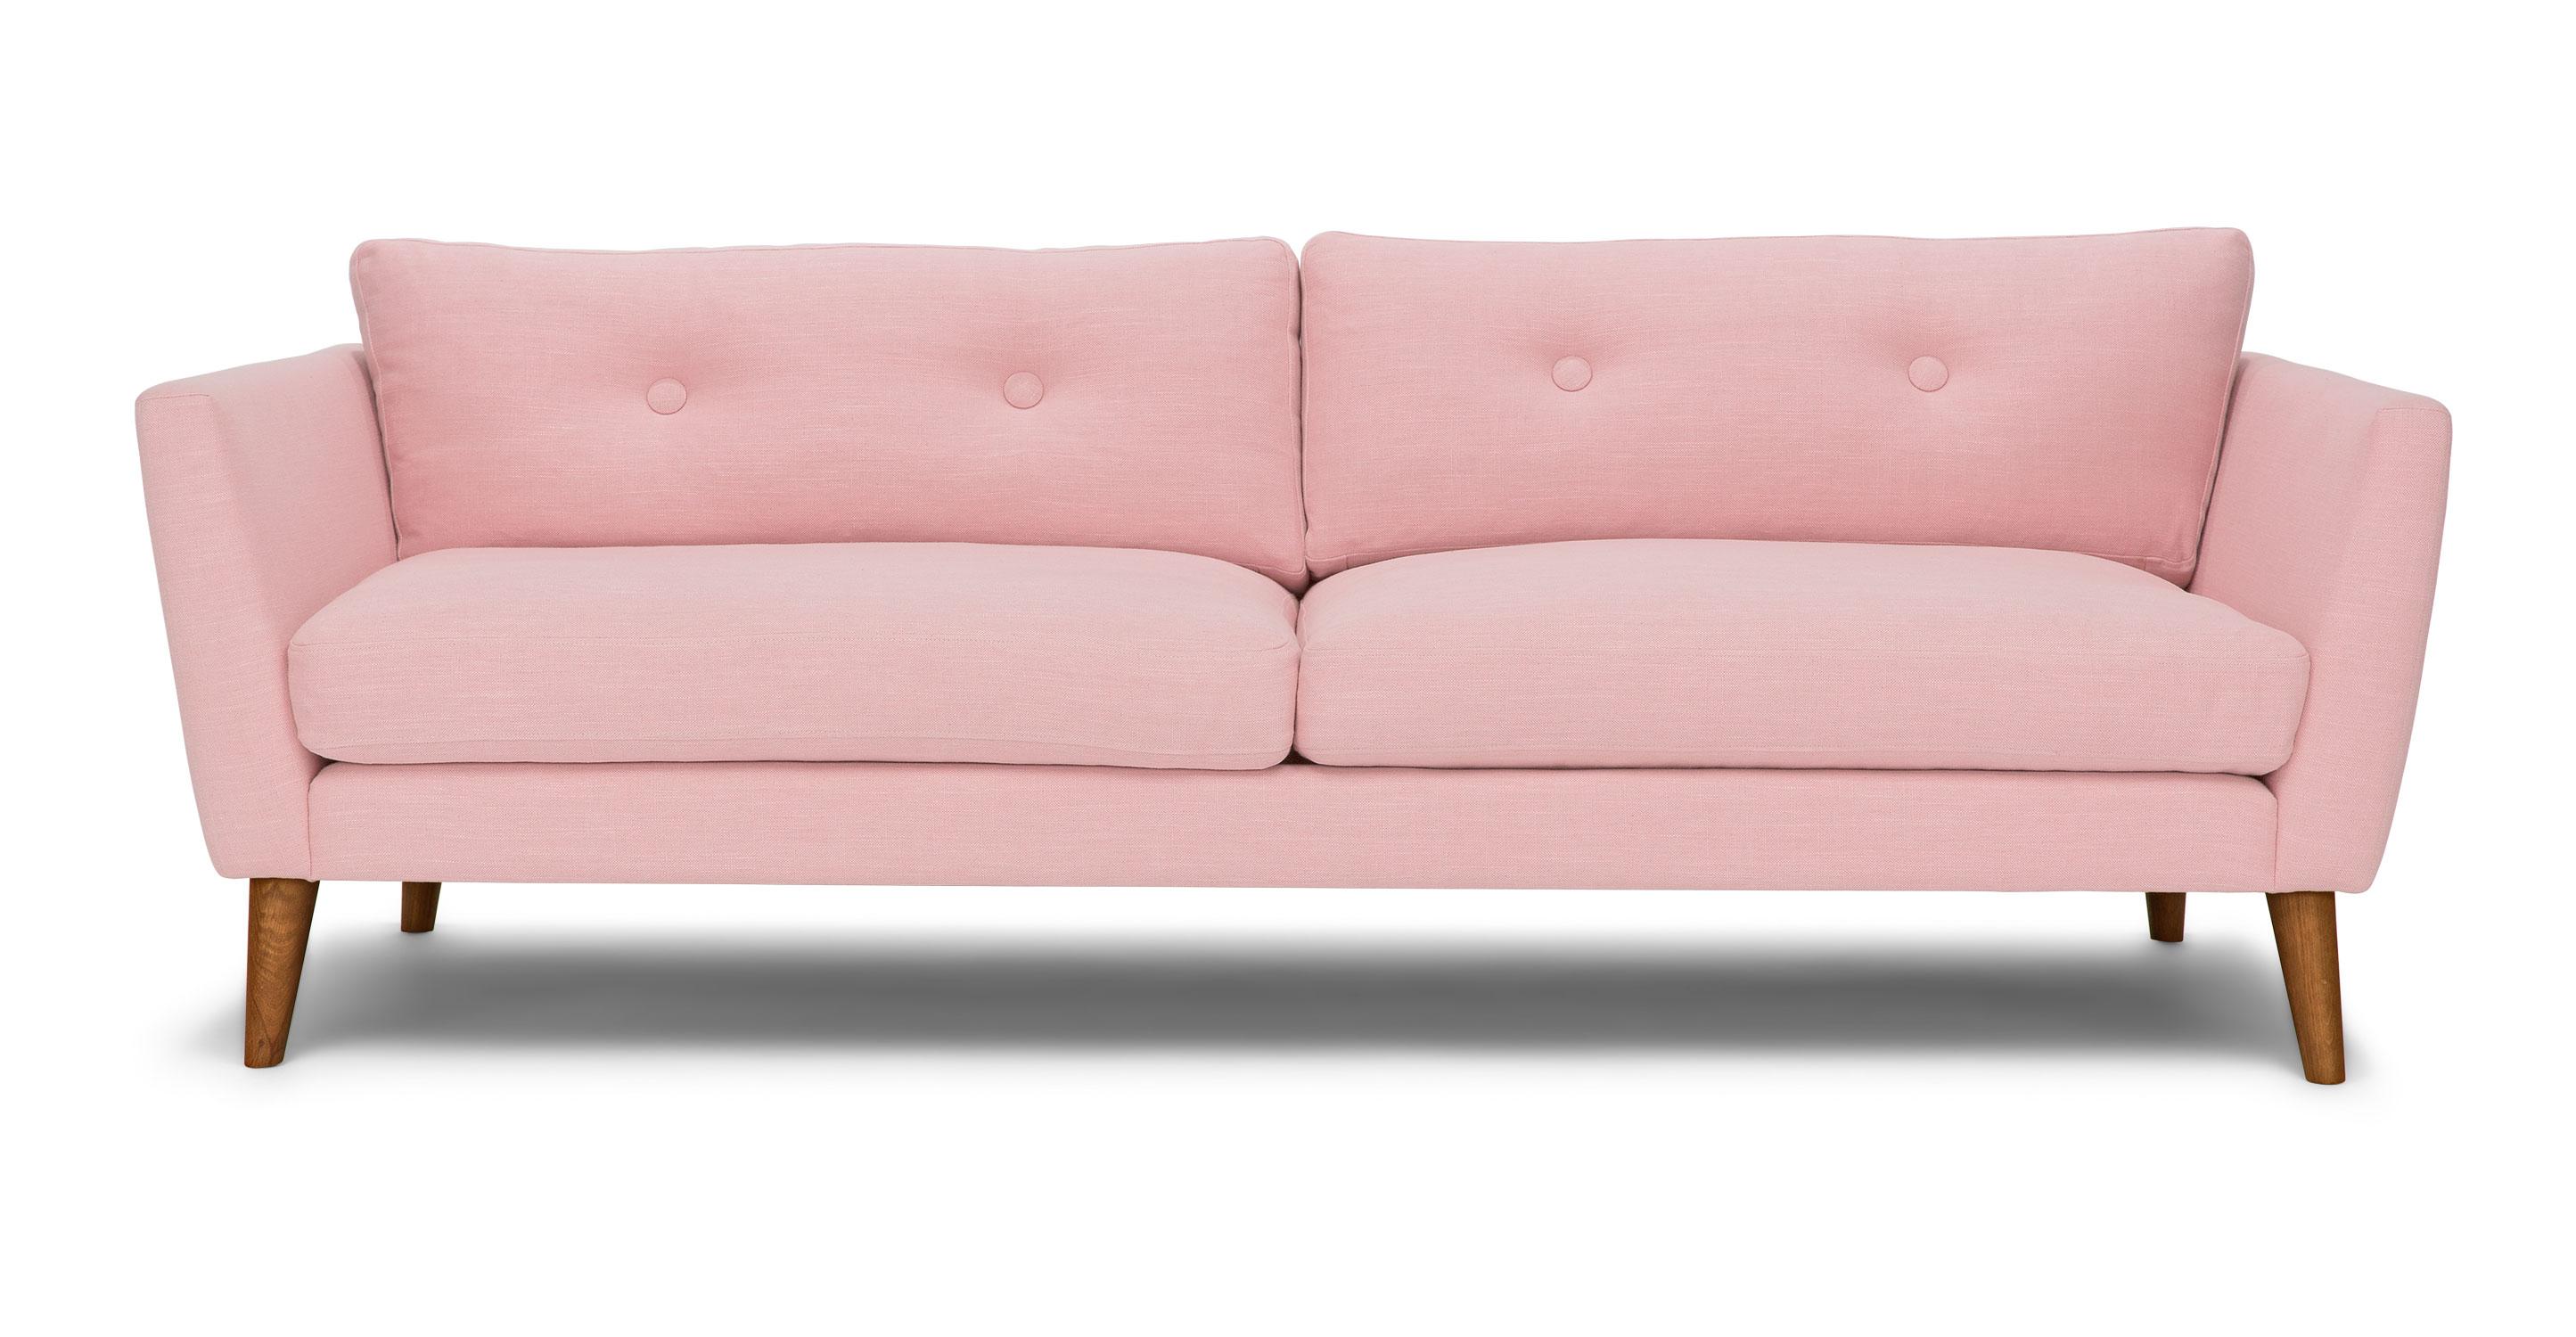 High Back Tufted Sofa